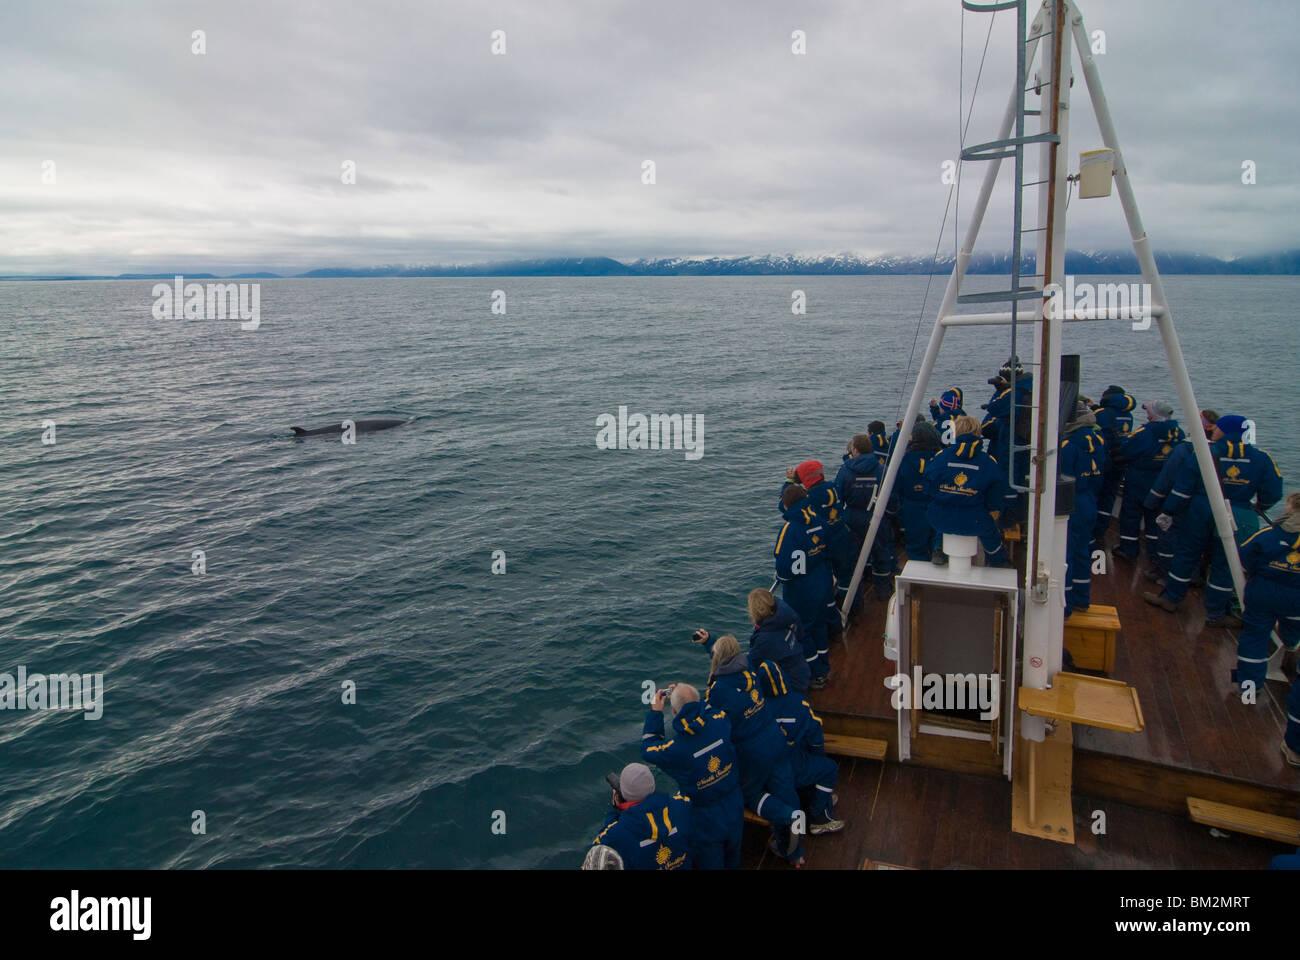 Trawler de touristes regardant une baleine, Husavik, l'Islande, les régions polaires Photo Stock